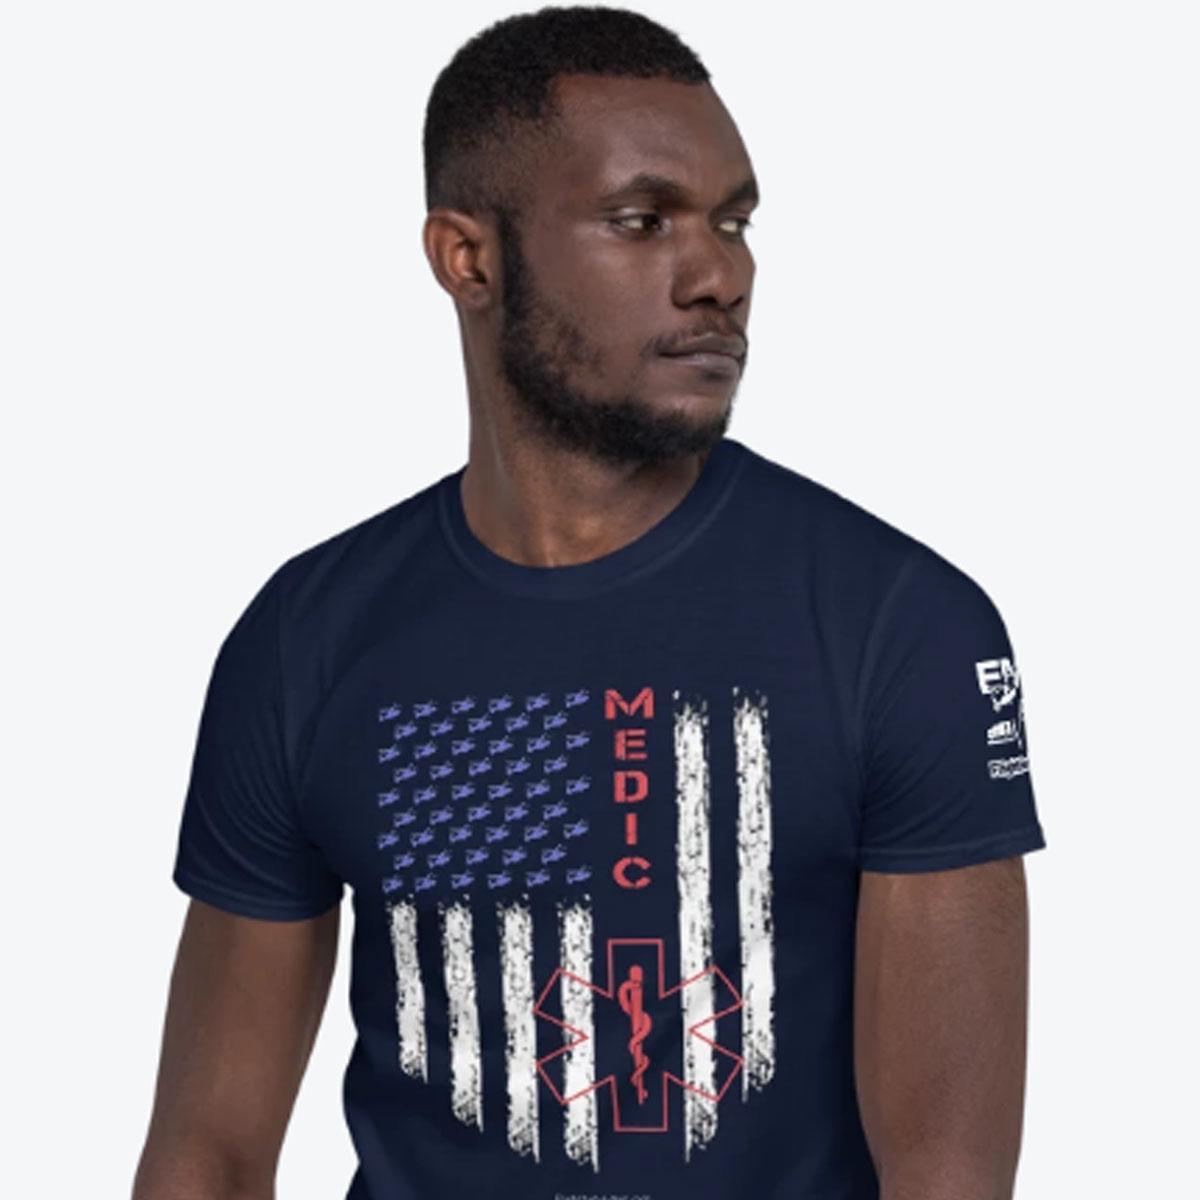 American Medic Pride Navy T-shirt 1200